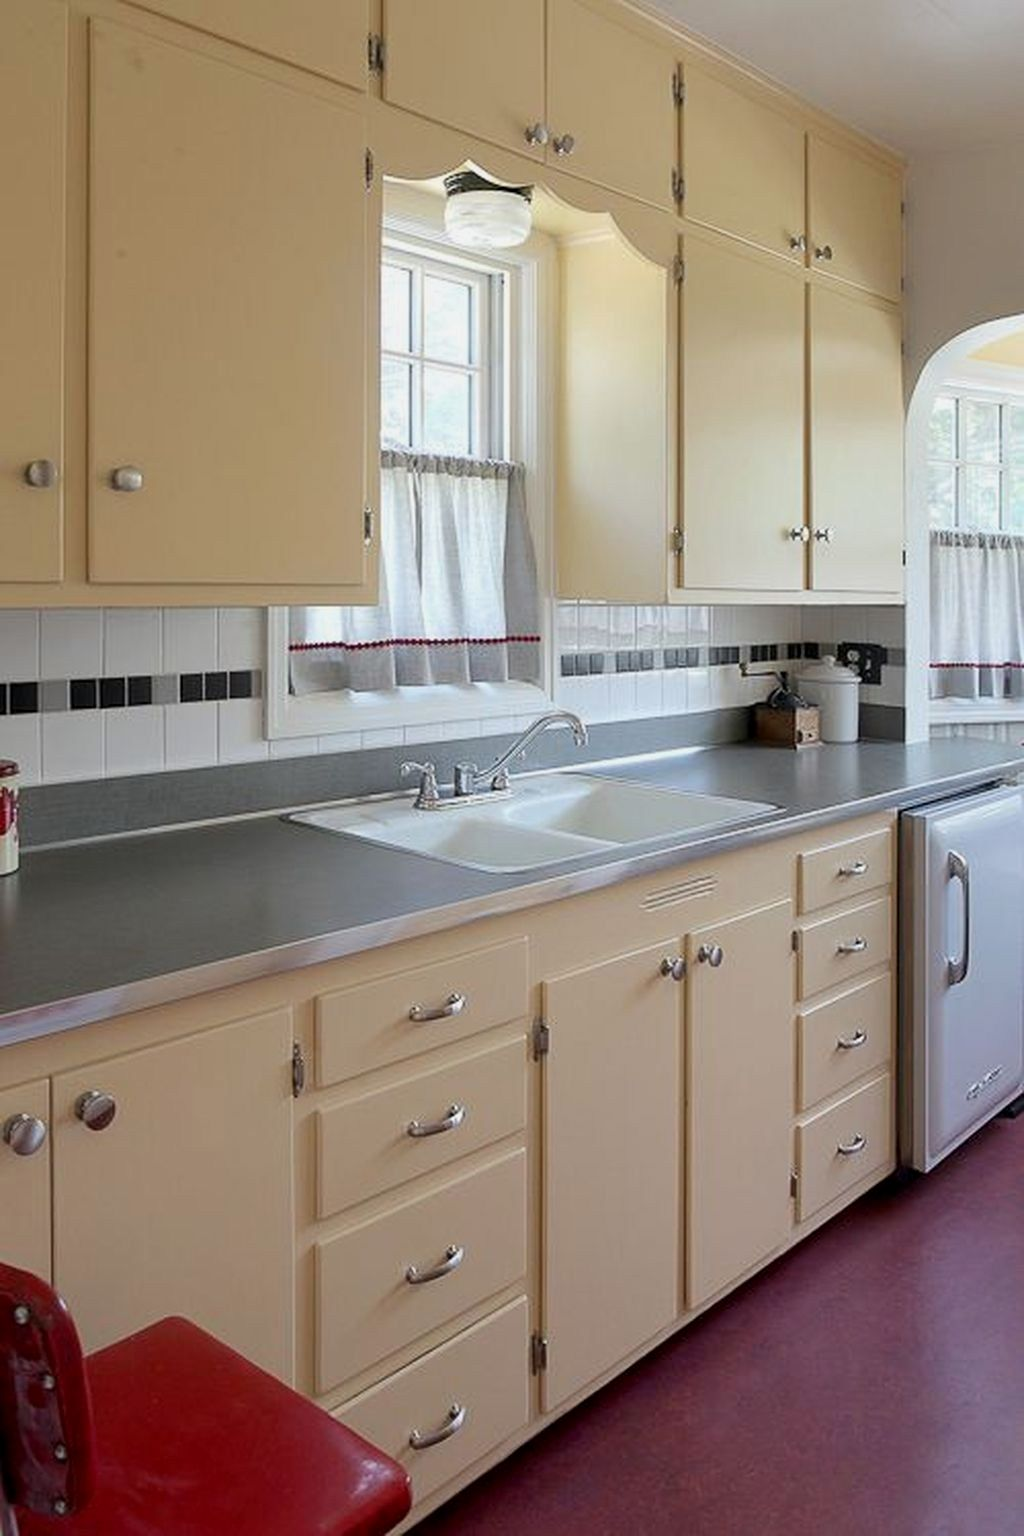 Pin On Art Deco Kitchens And Stuff